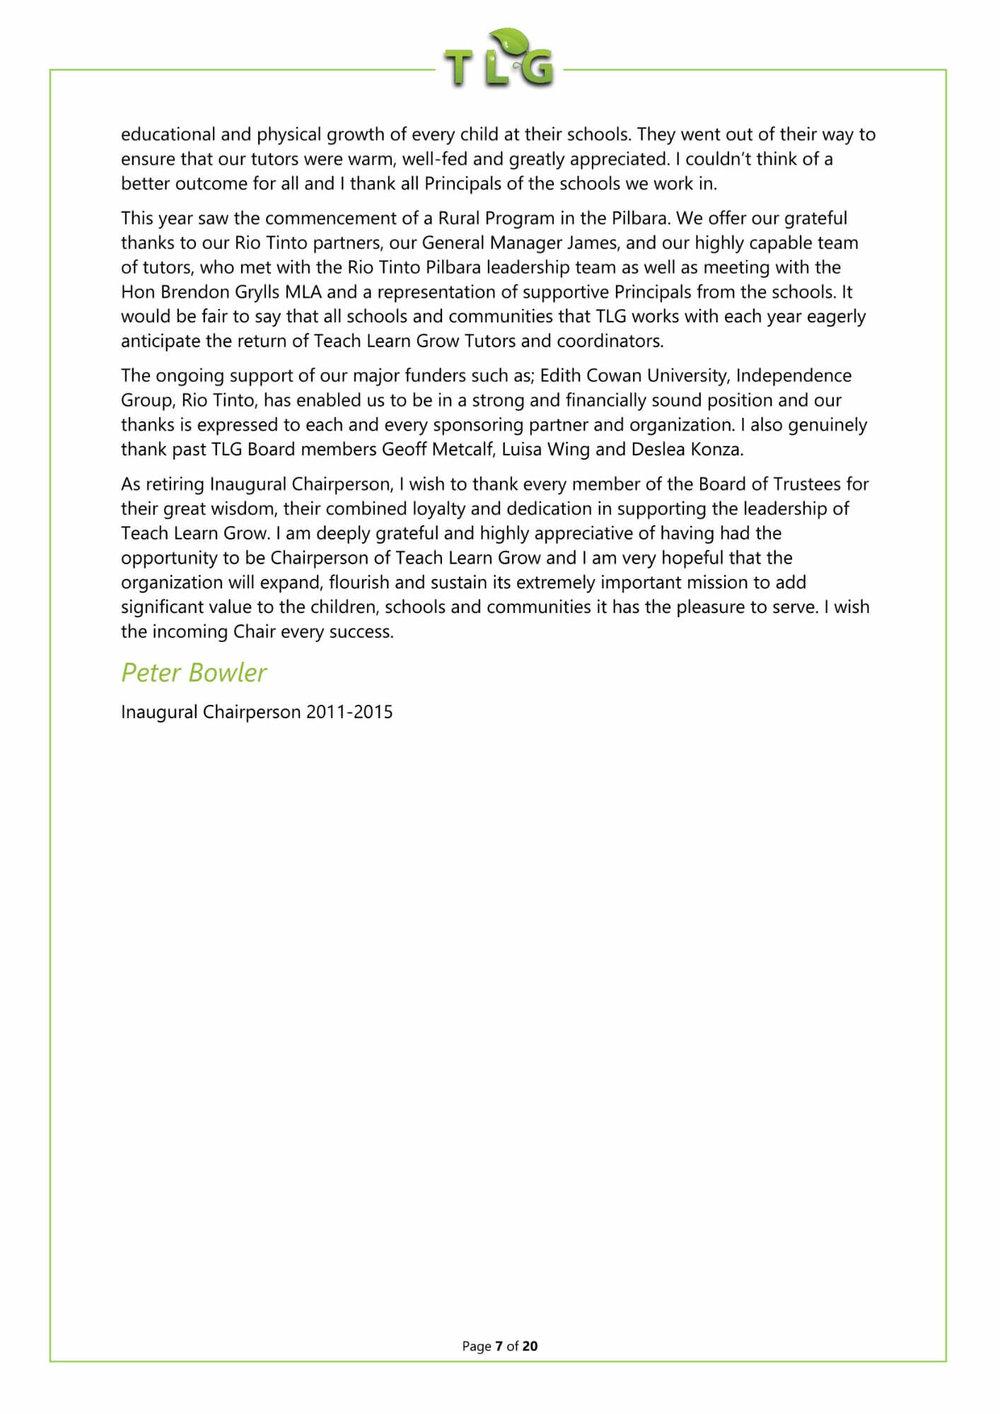 tlg-annual-report-FY14-07.jpg